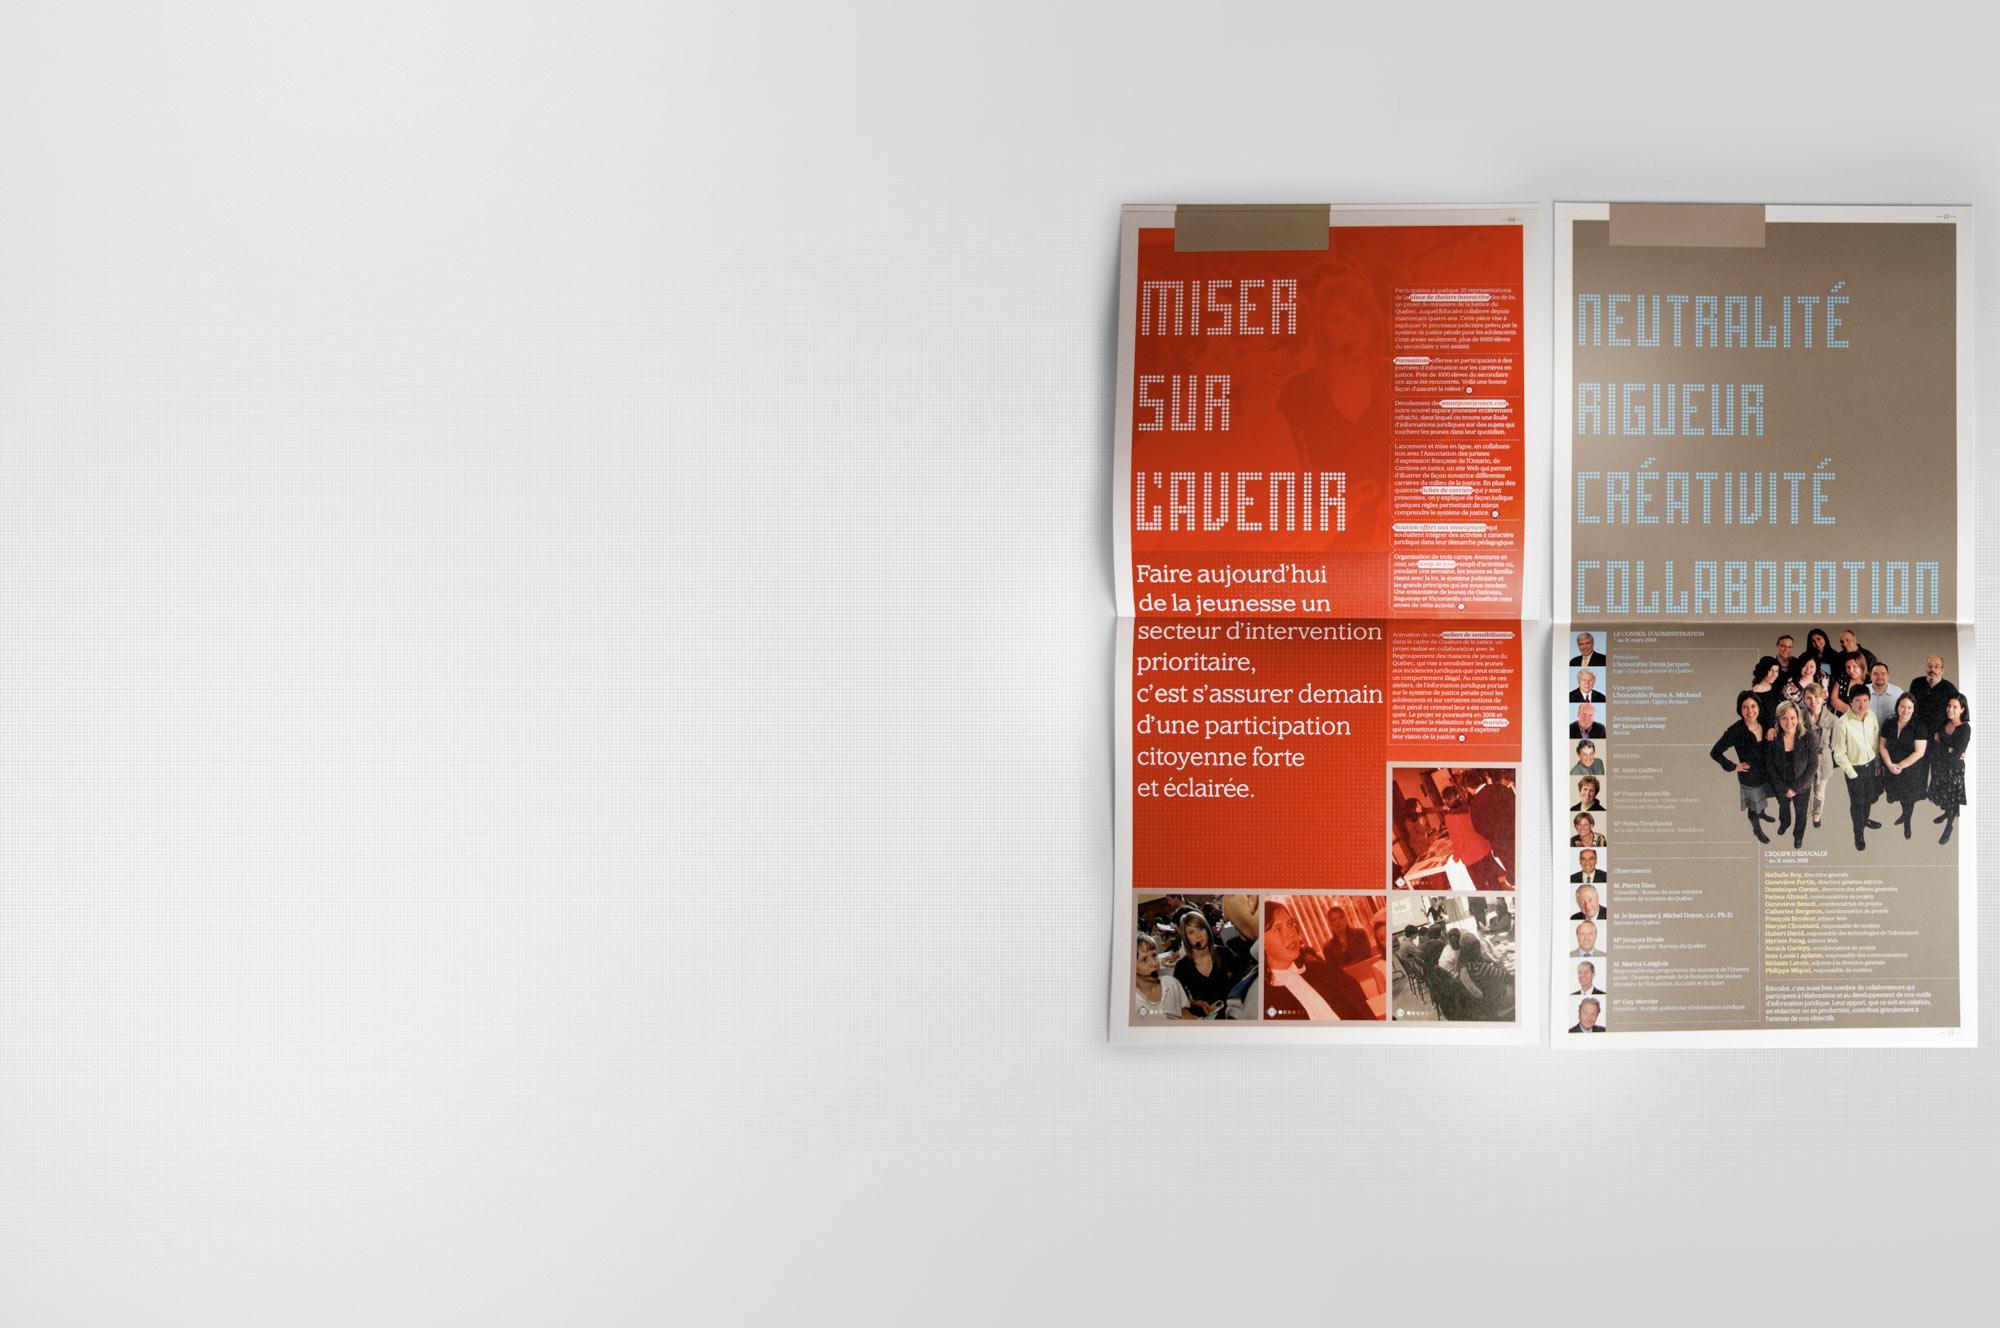 FOLIO - Educaloi_Rapport annuel 2008 | Zen Branding Design & Com